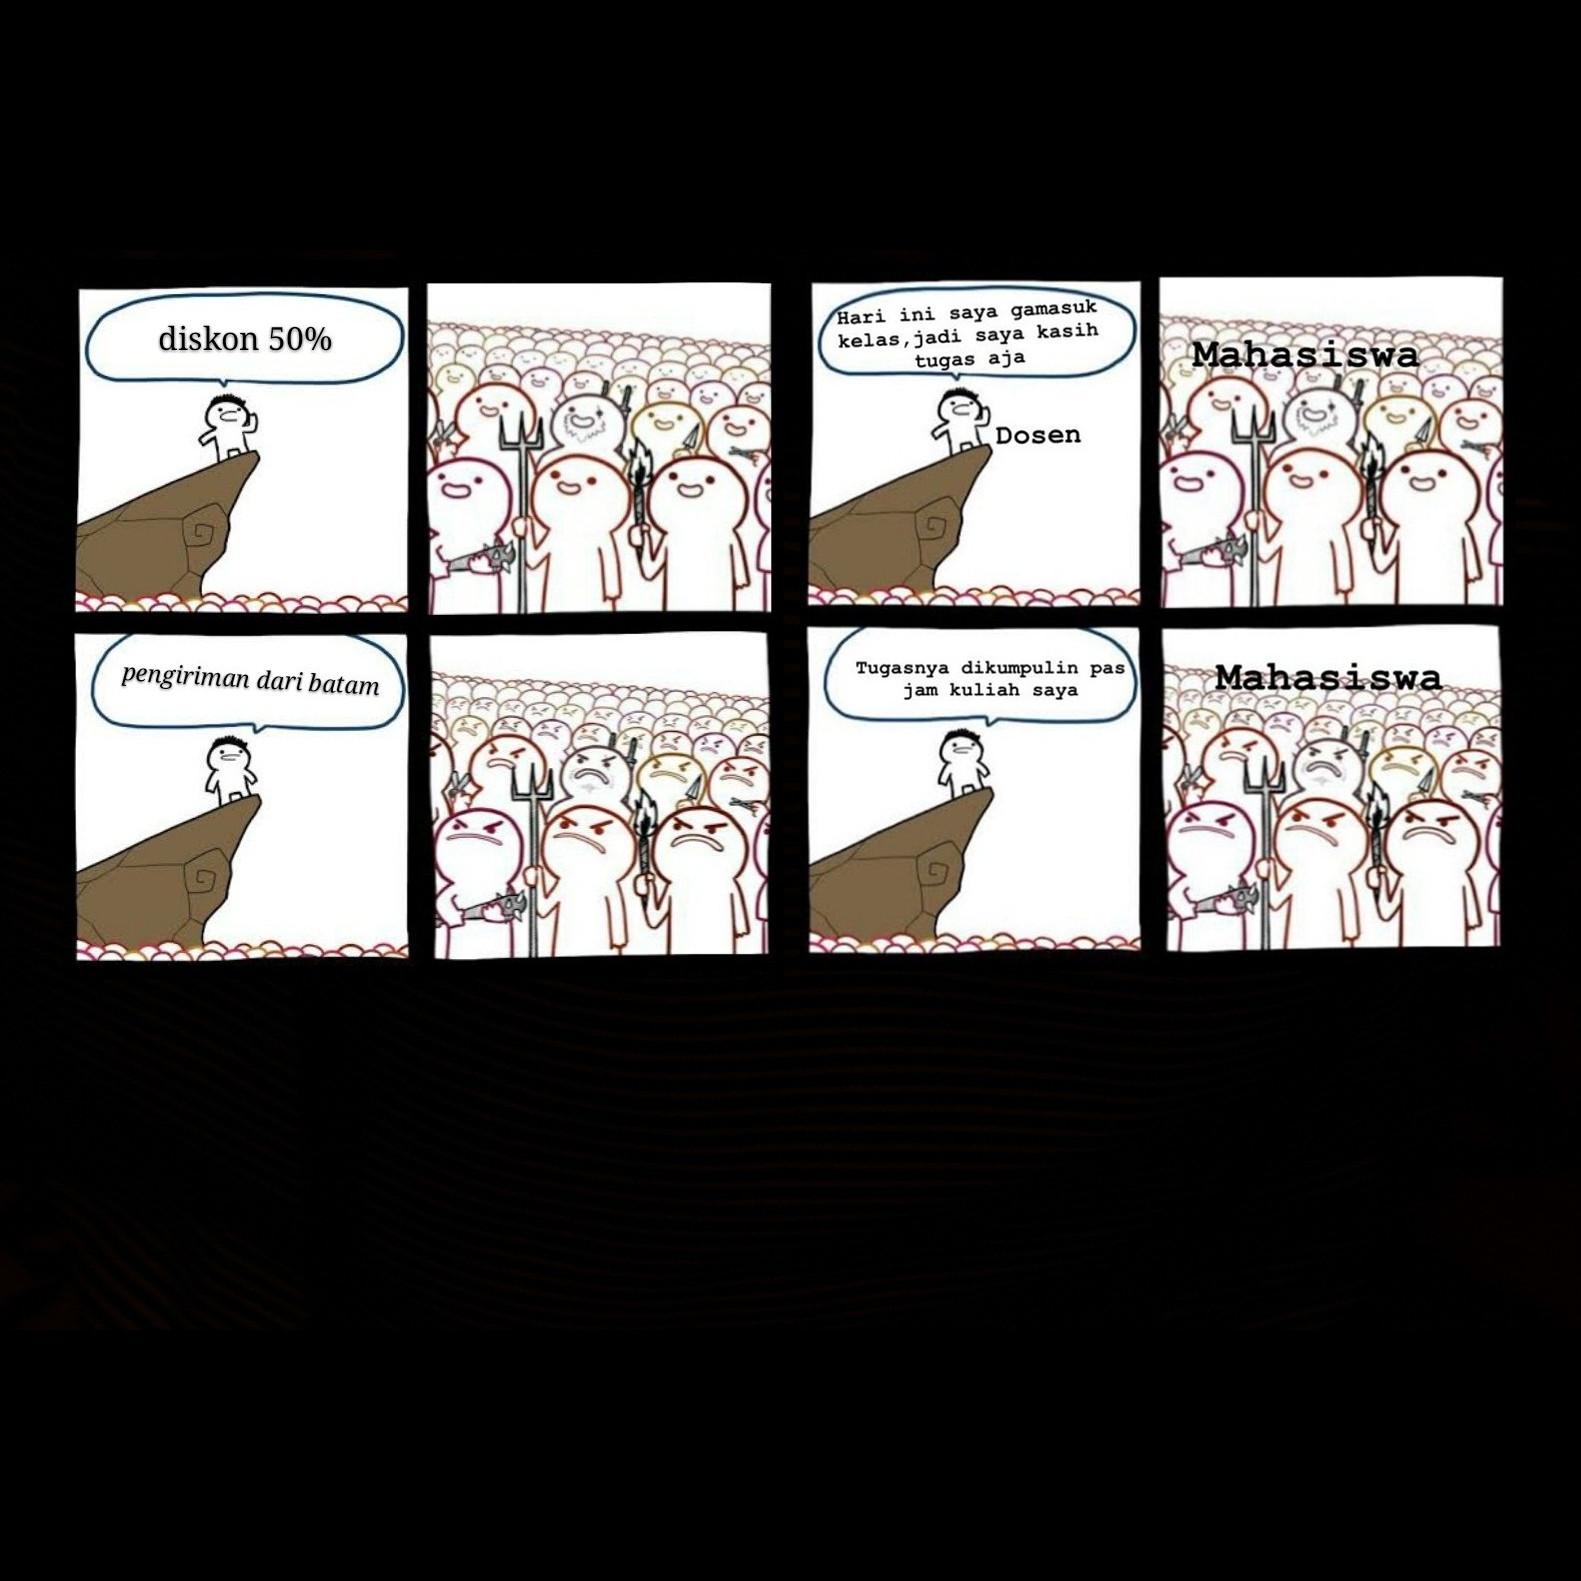 10 Meme Lucu Sekumpulan Orang Bikin Langsung Pengen Ketawa